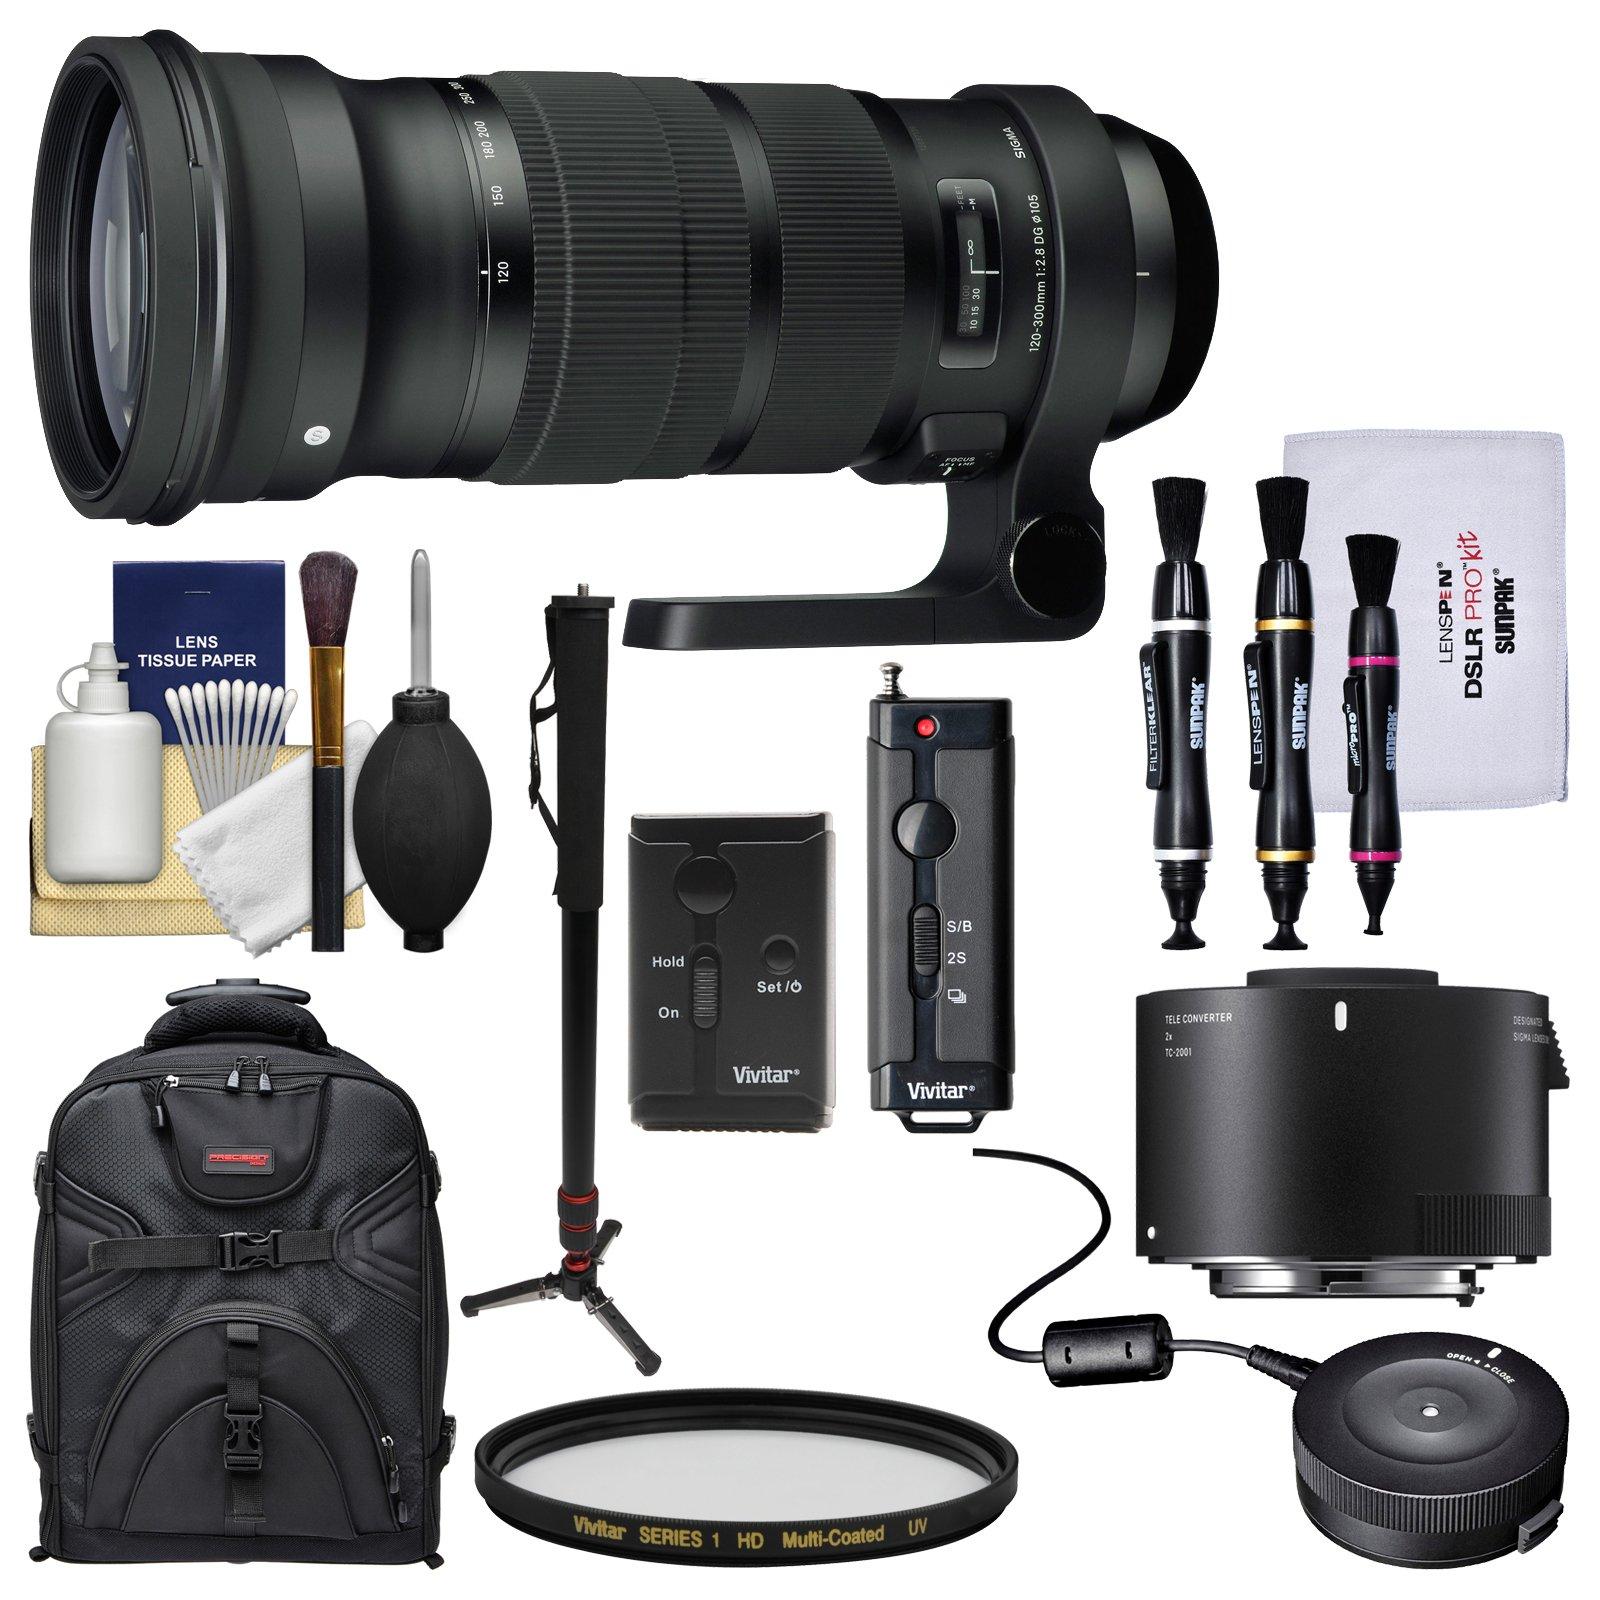 Sigma 120-300mm f/2.8 Sports DG APO OS HSM Zoom Lens with TC-2001 2x Teleconverter + USB Dock + Backpack + Monopod + Kit for Nikon DSLR Cameras